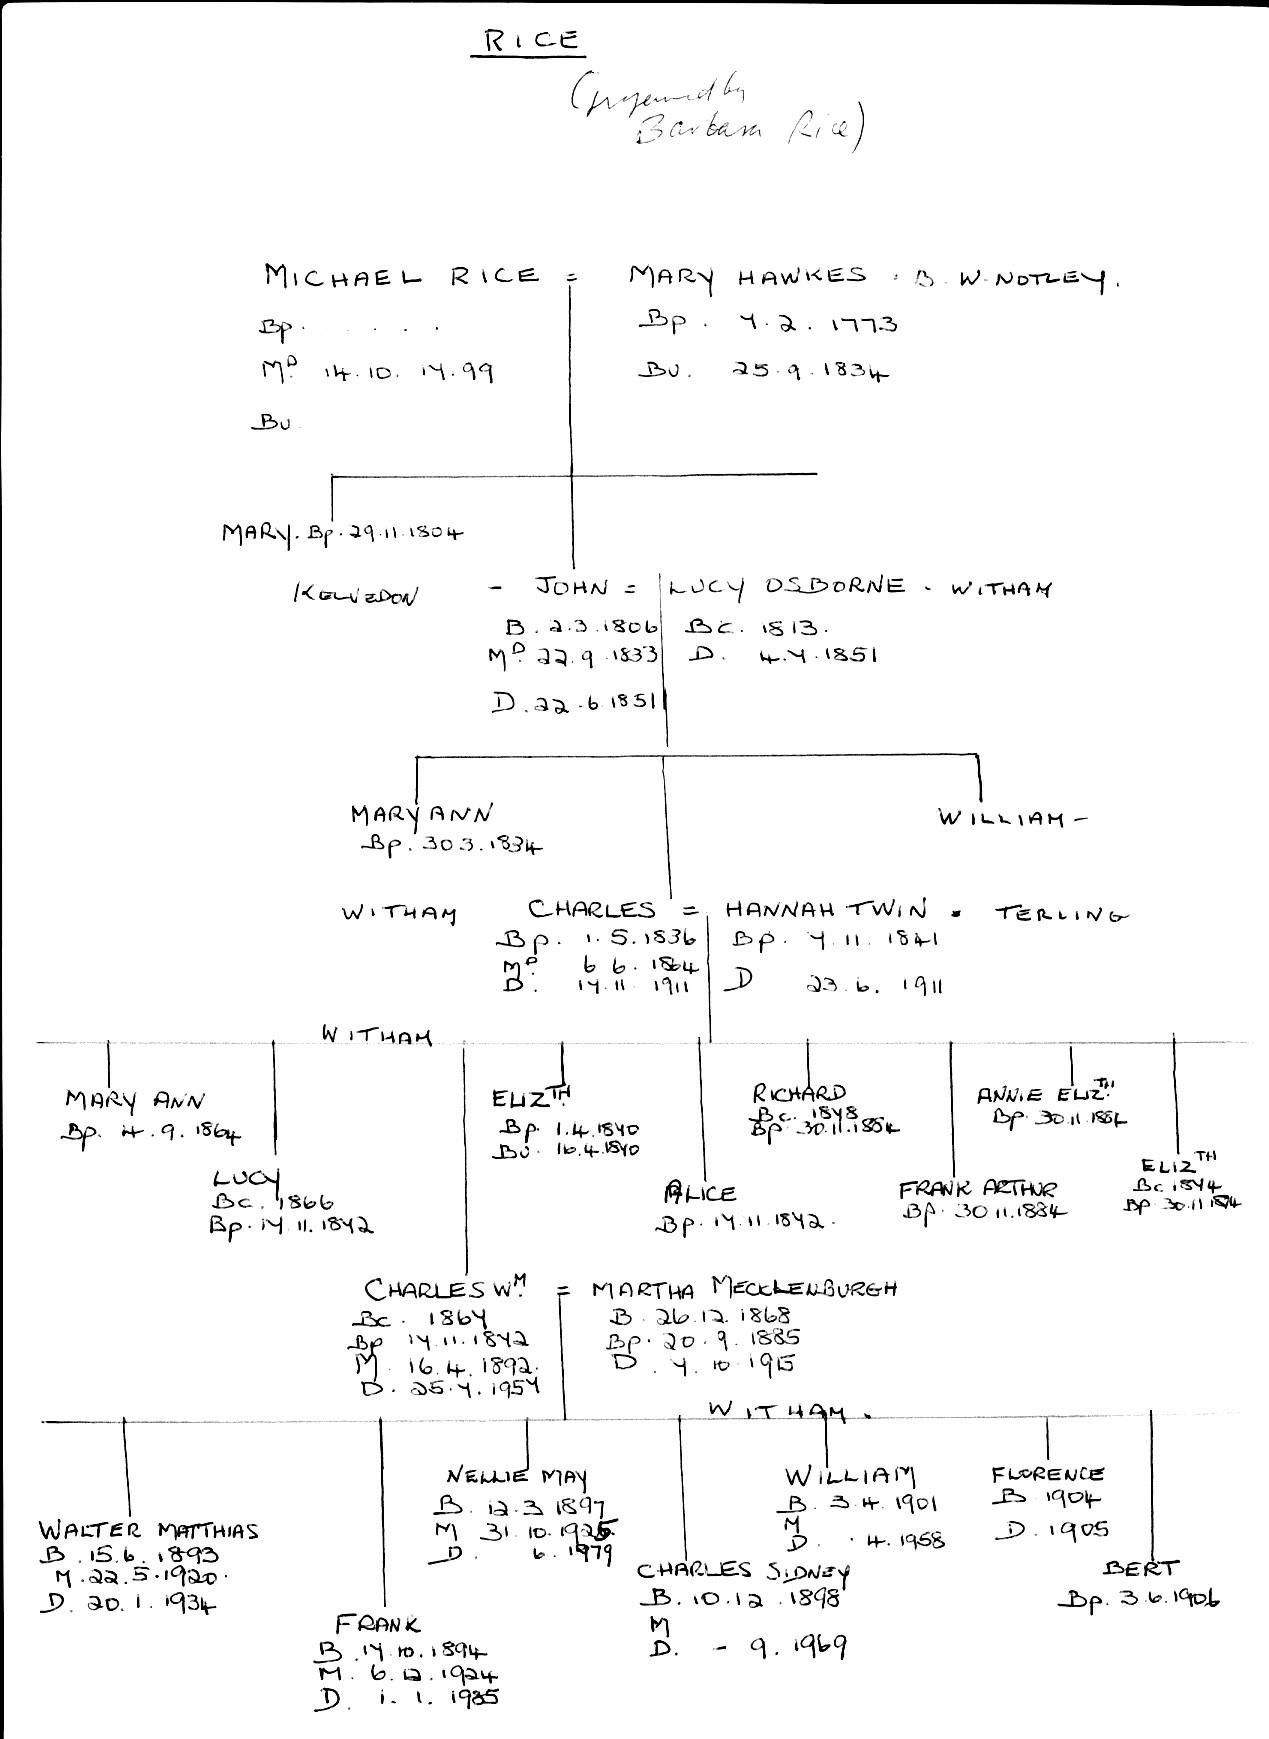 Rice family tree. Barbara's father was Walter (bottom left)